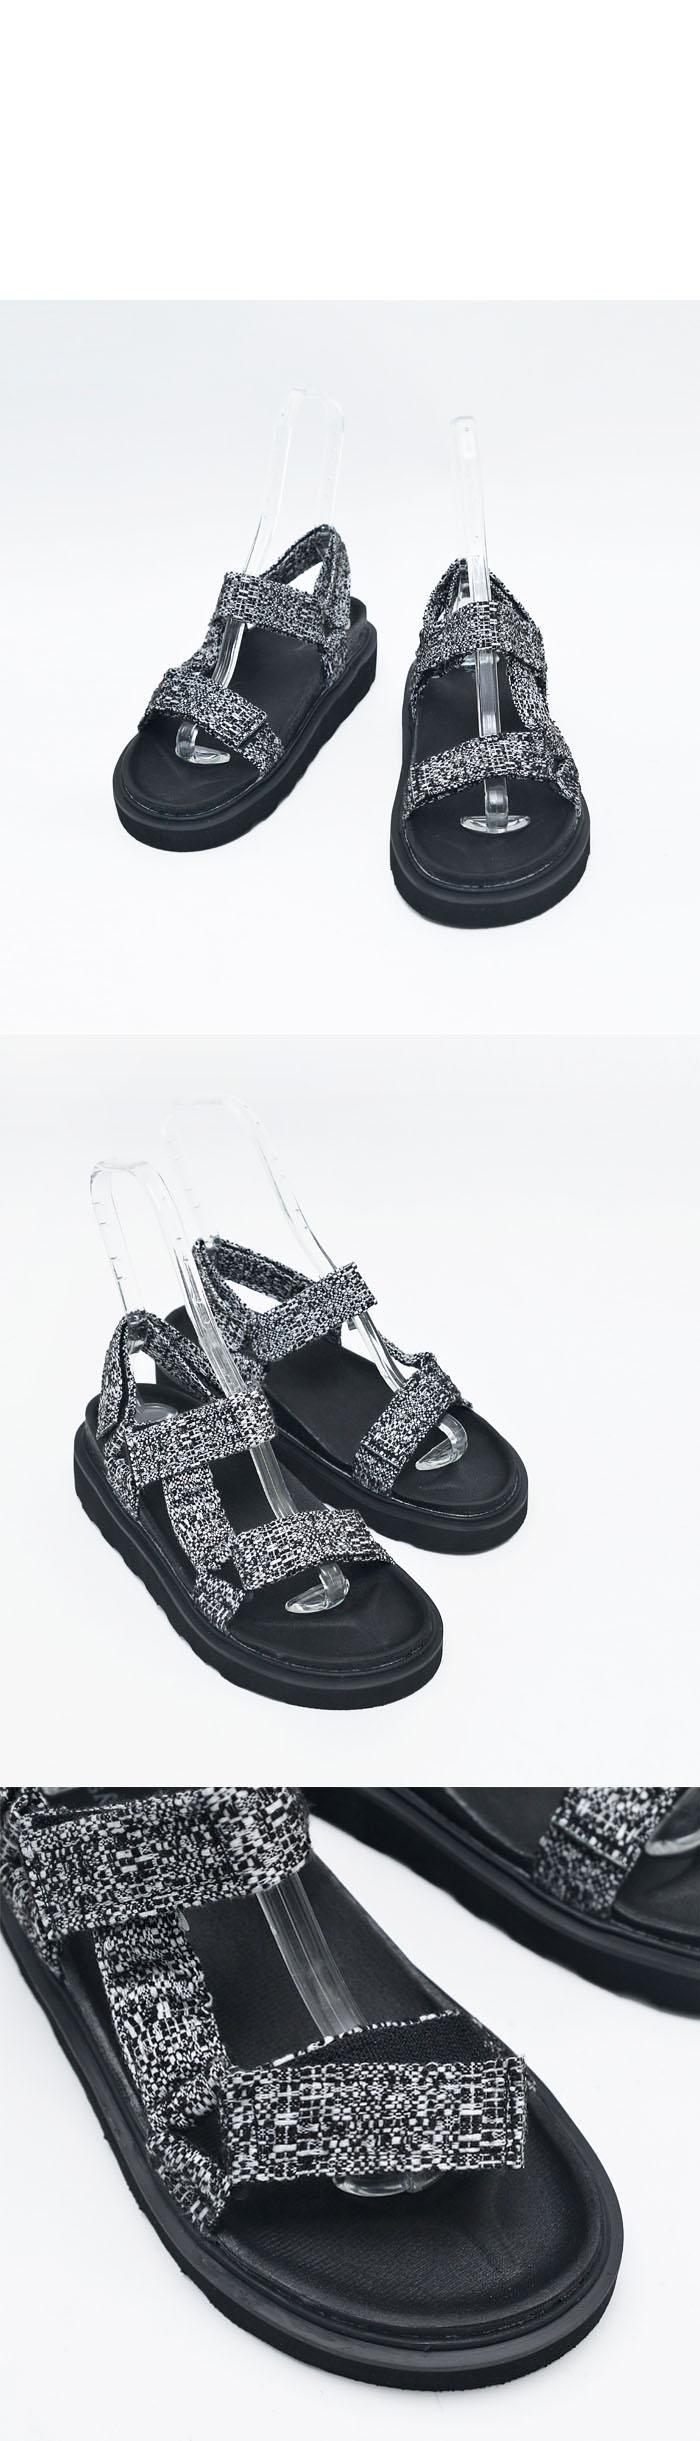 Height Increaing Fabric Buckle Sandal-Shoes 437 - GUYLOOK